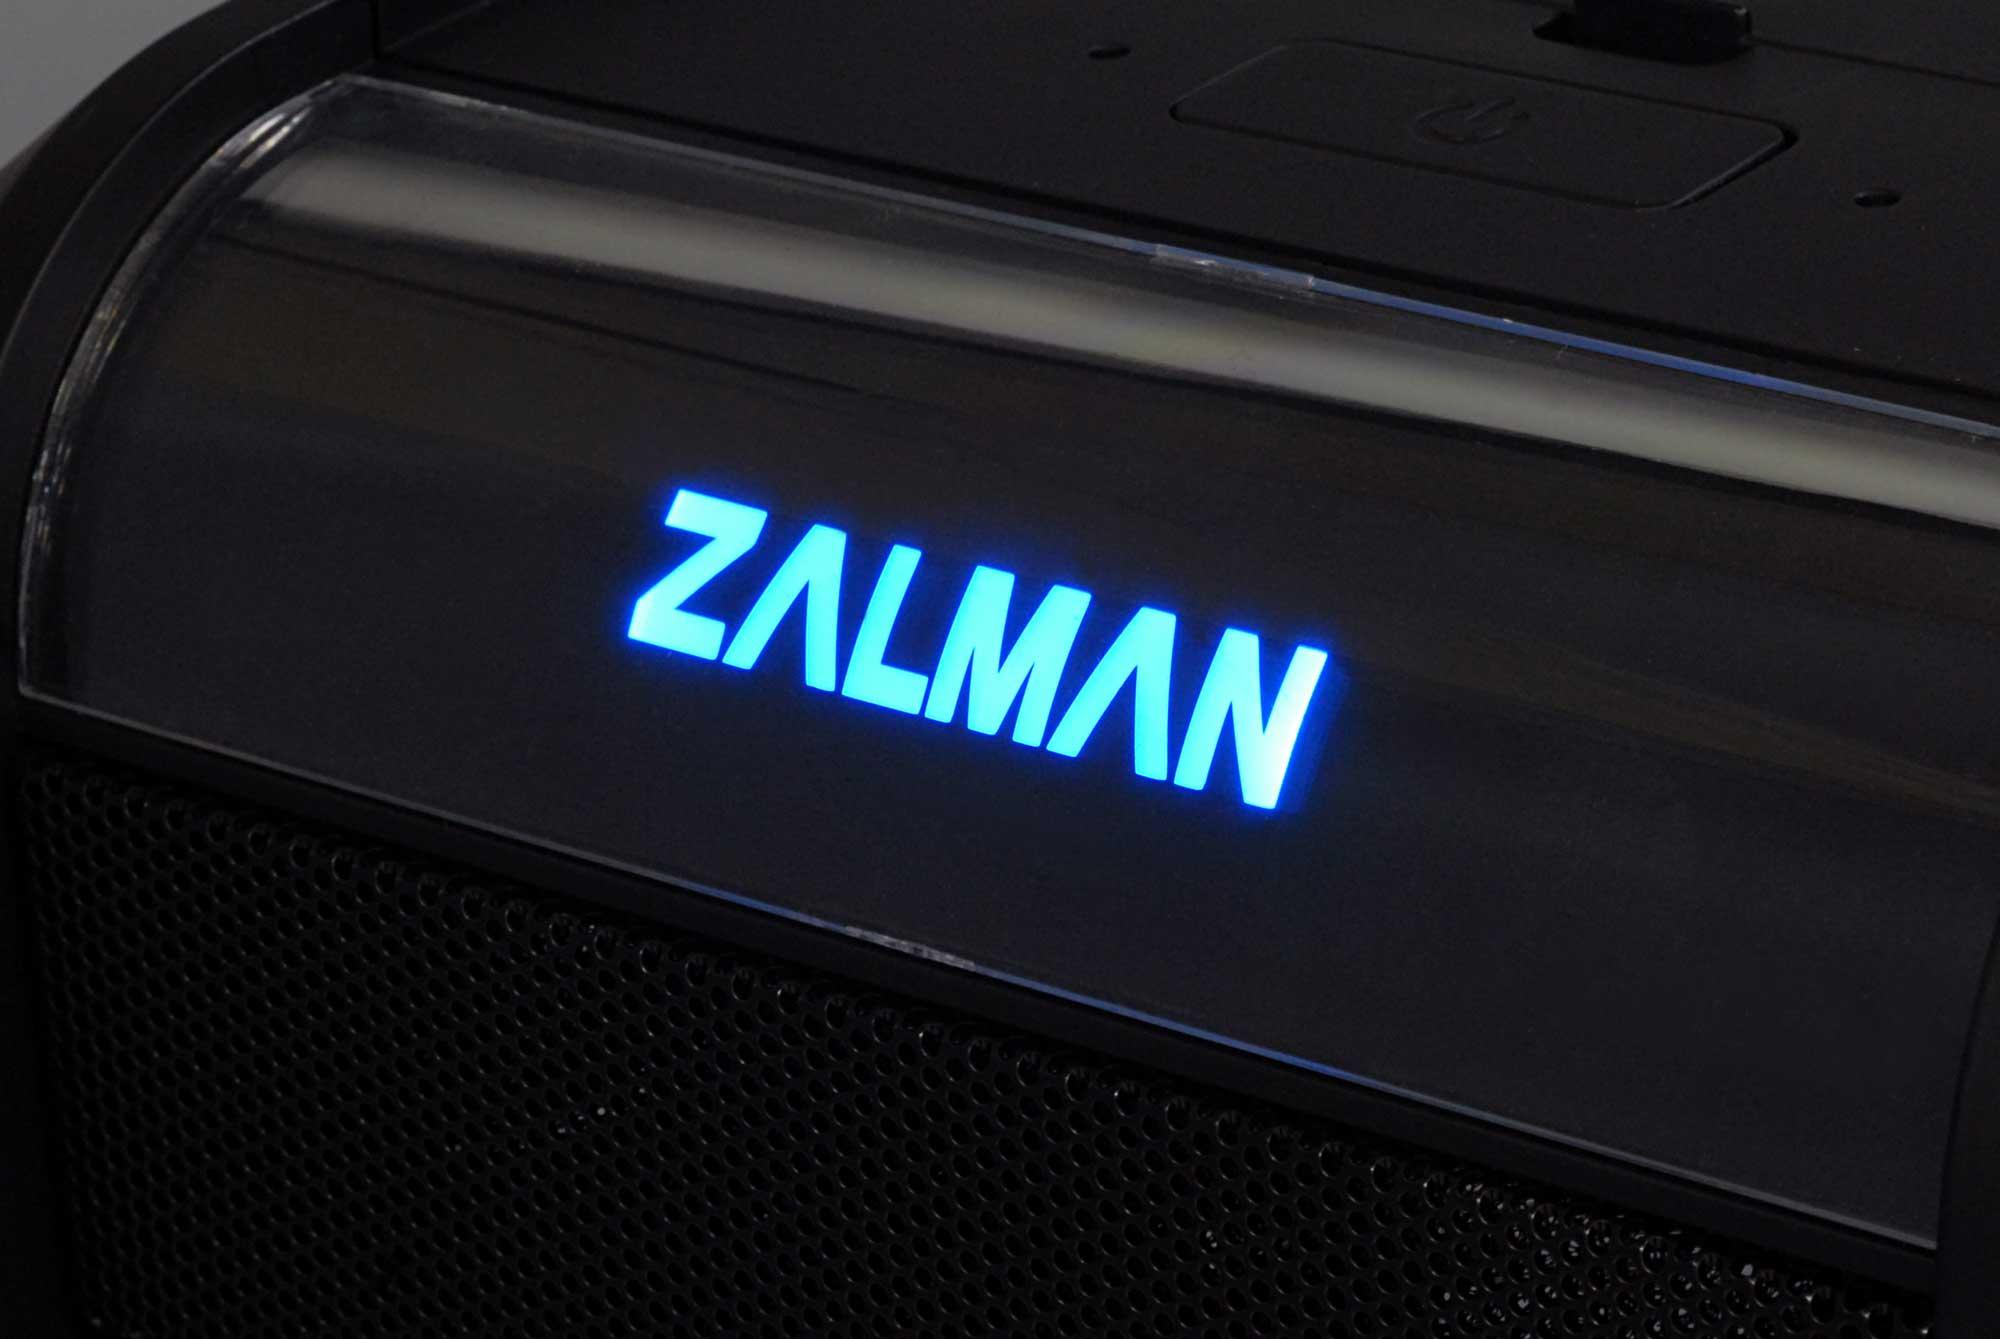 Zalman Z7 Atx Mid Tower Pc Cases